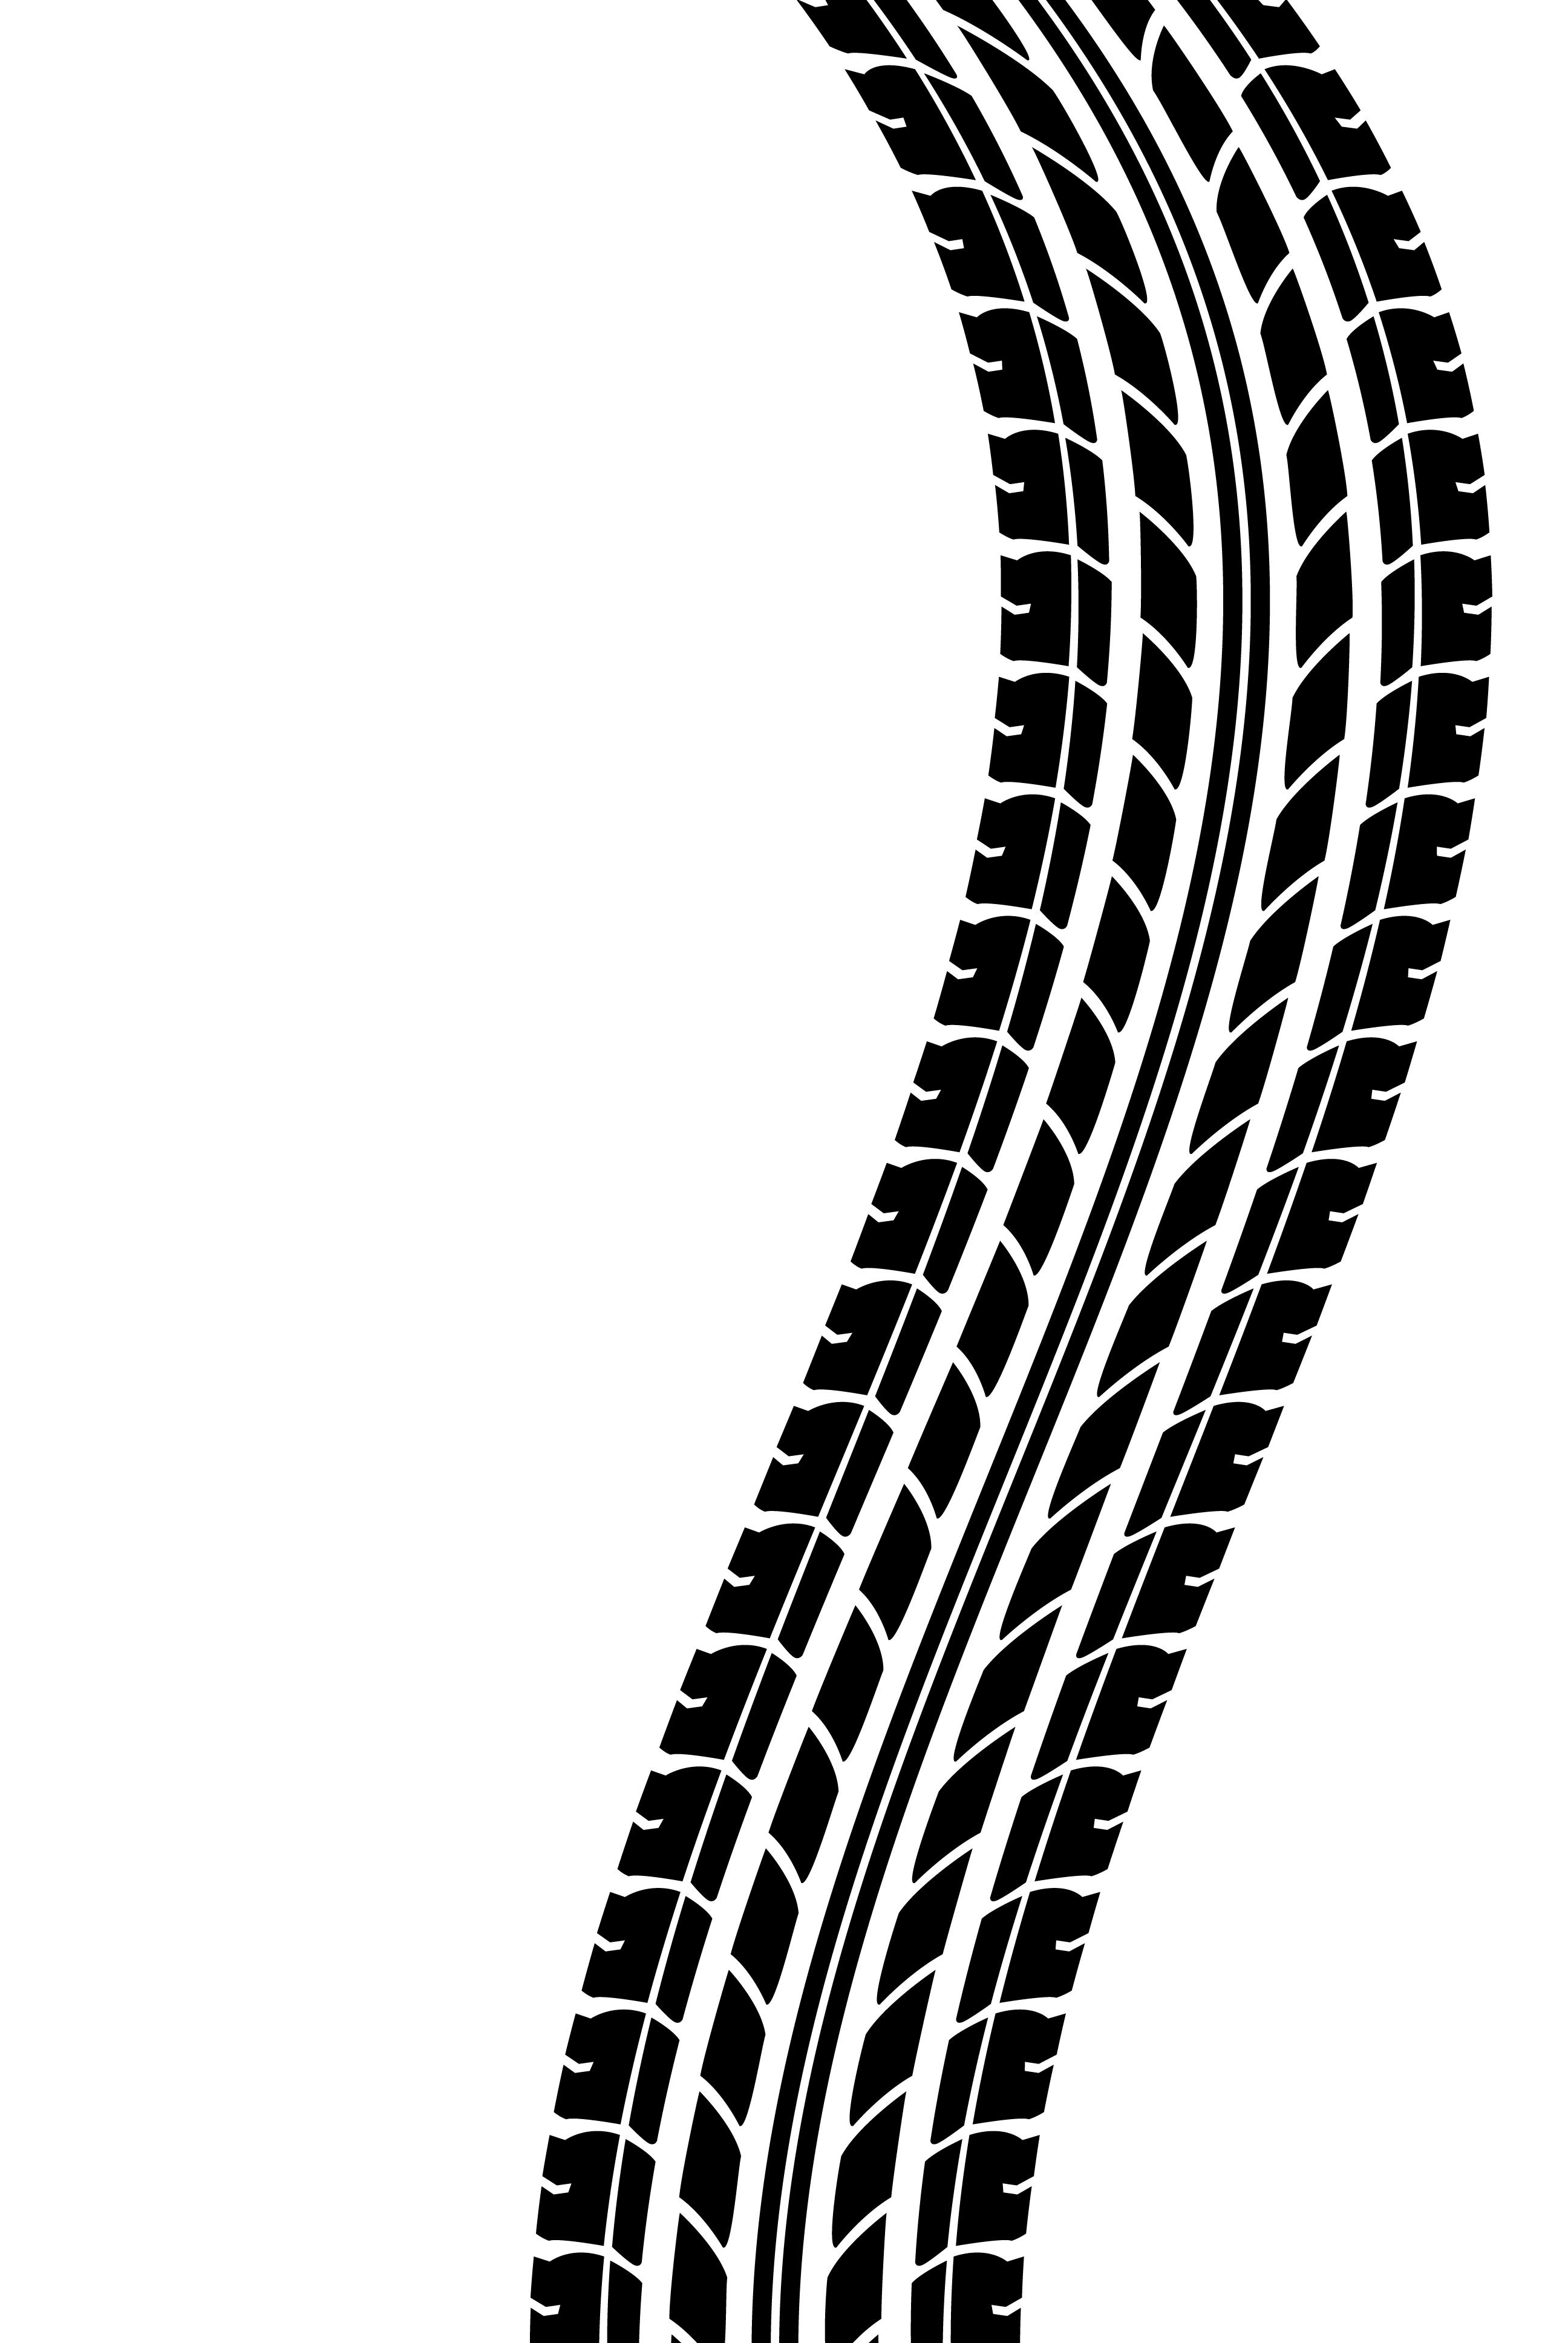 Free Tire Tracks, Download Free Clip Art, Free Clip Art on.